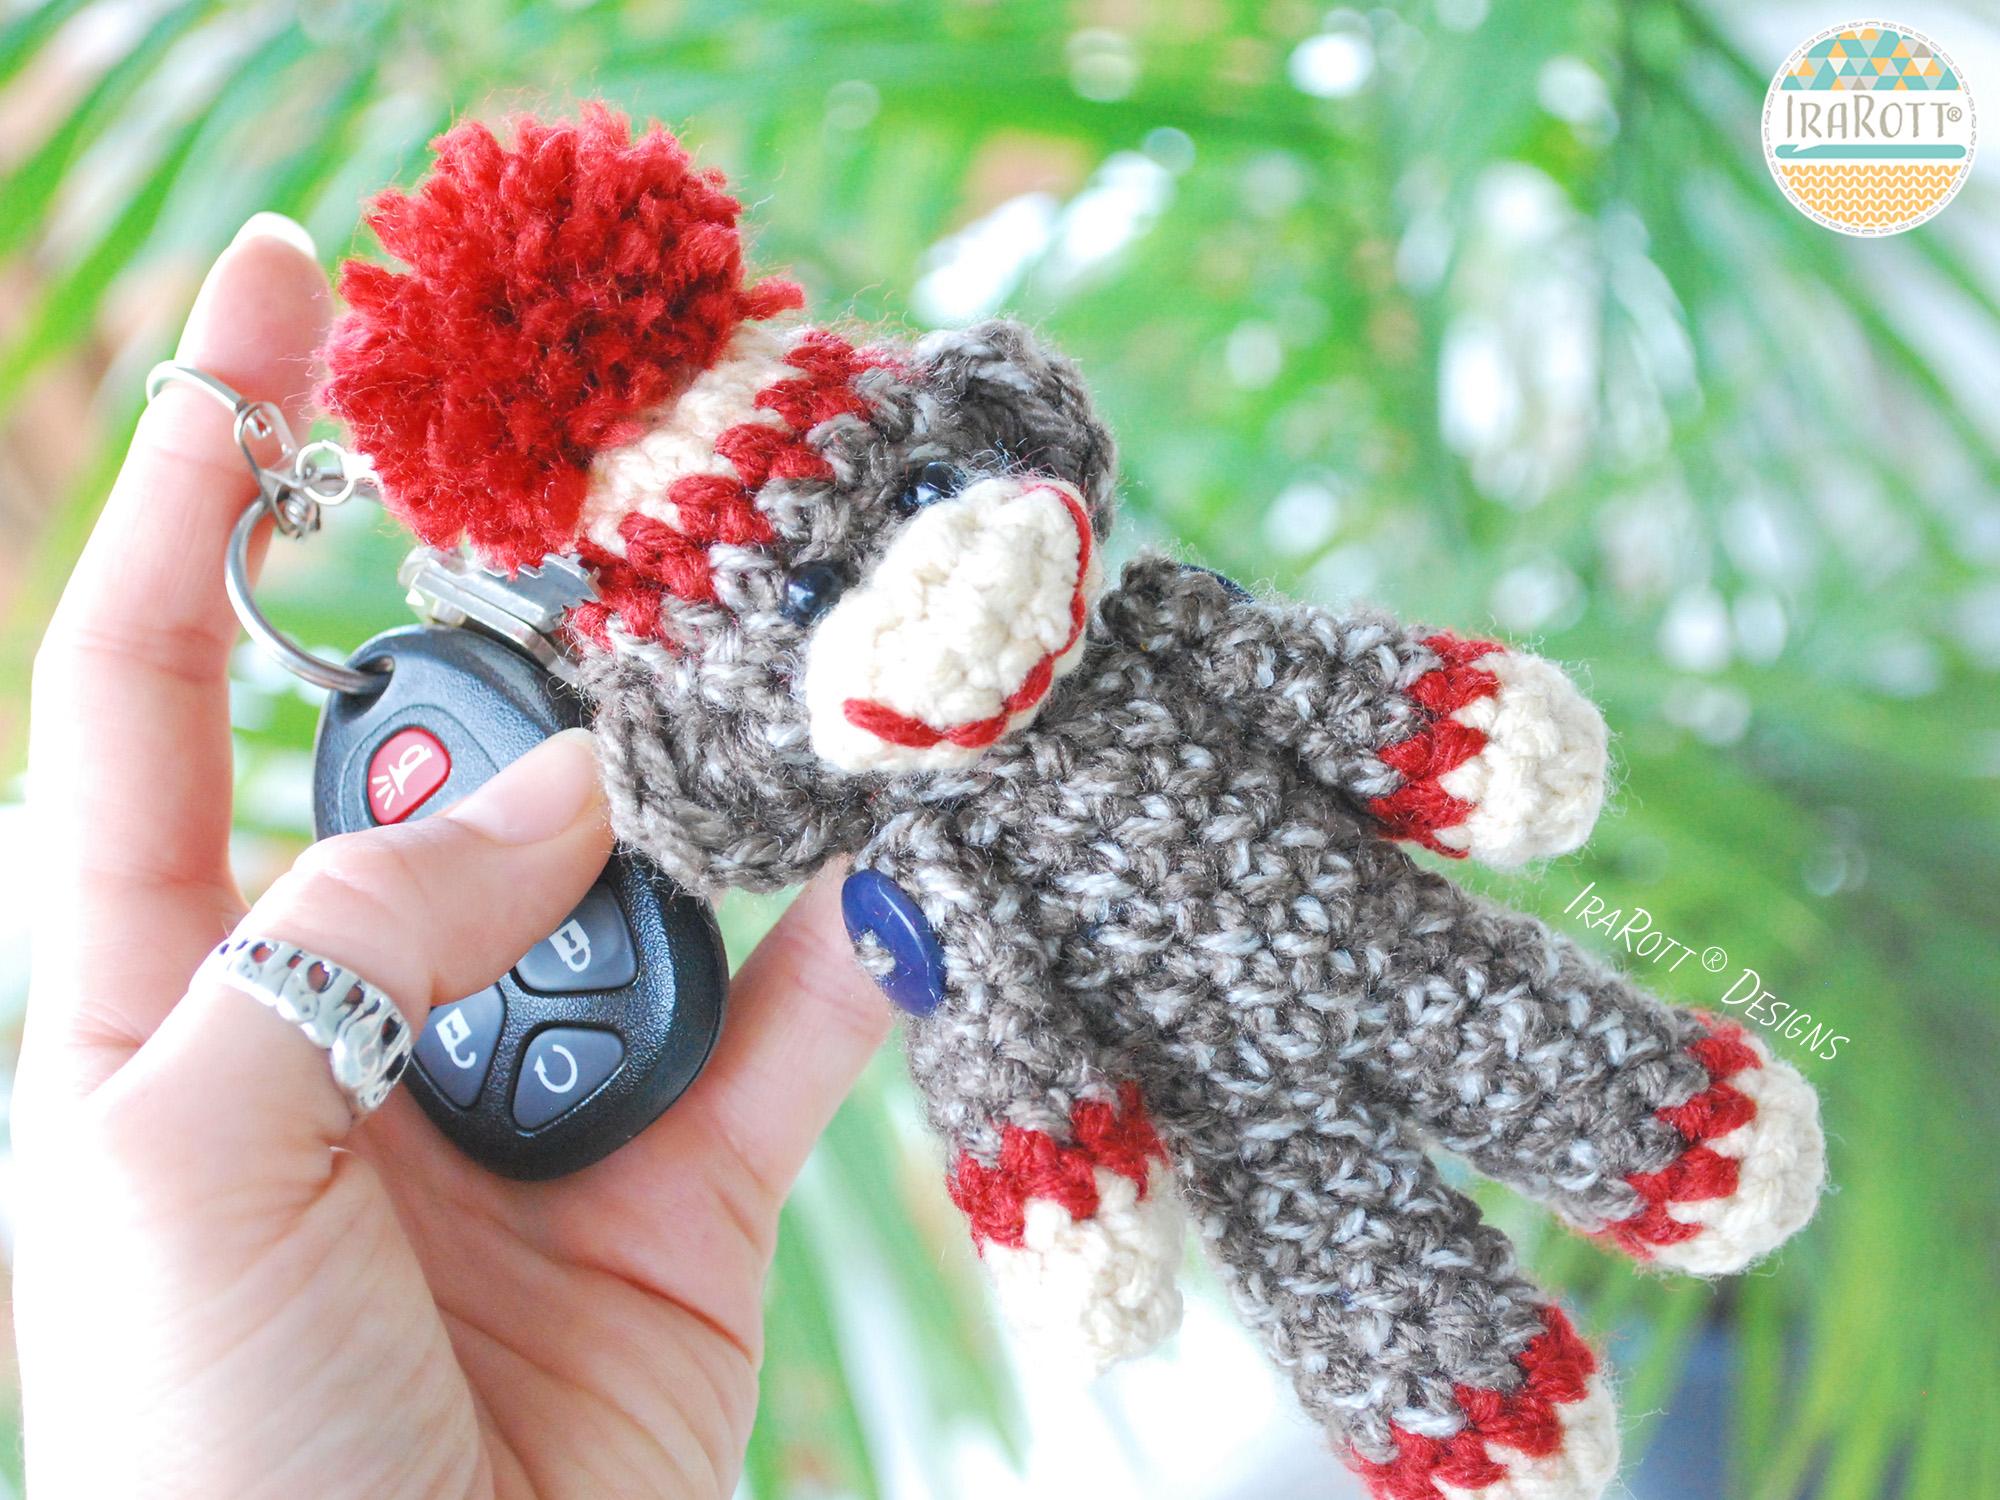 Free Pattern Amigurumi My Little Pony : Ima lil Monkey Key Chain PDF Crochet Pattern - IraRott Inc.